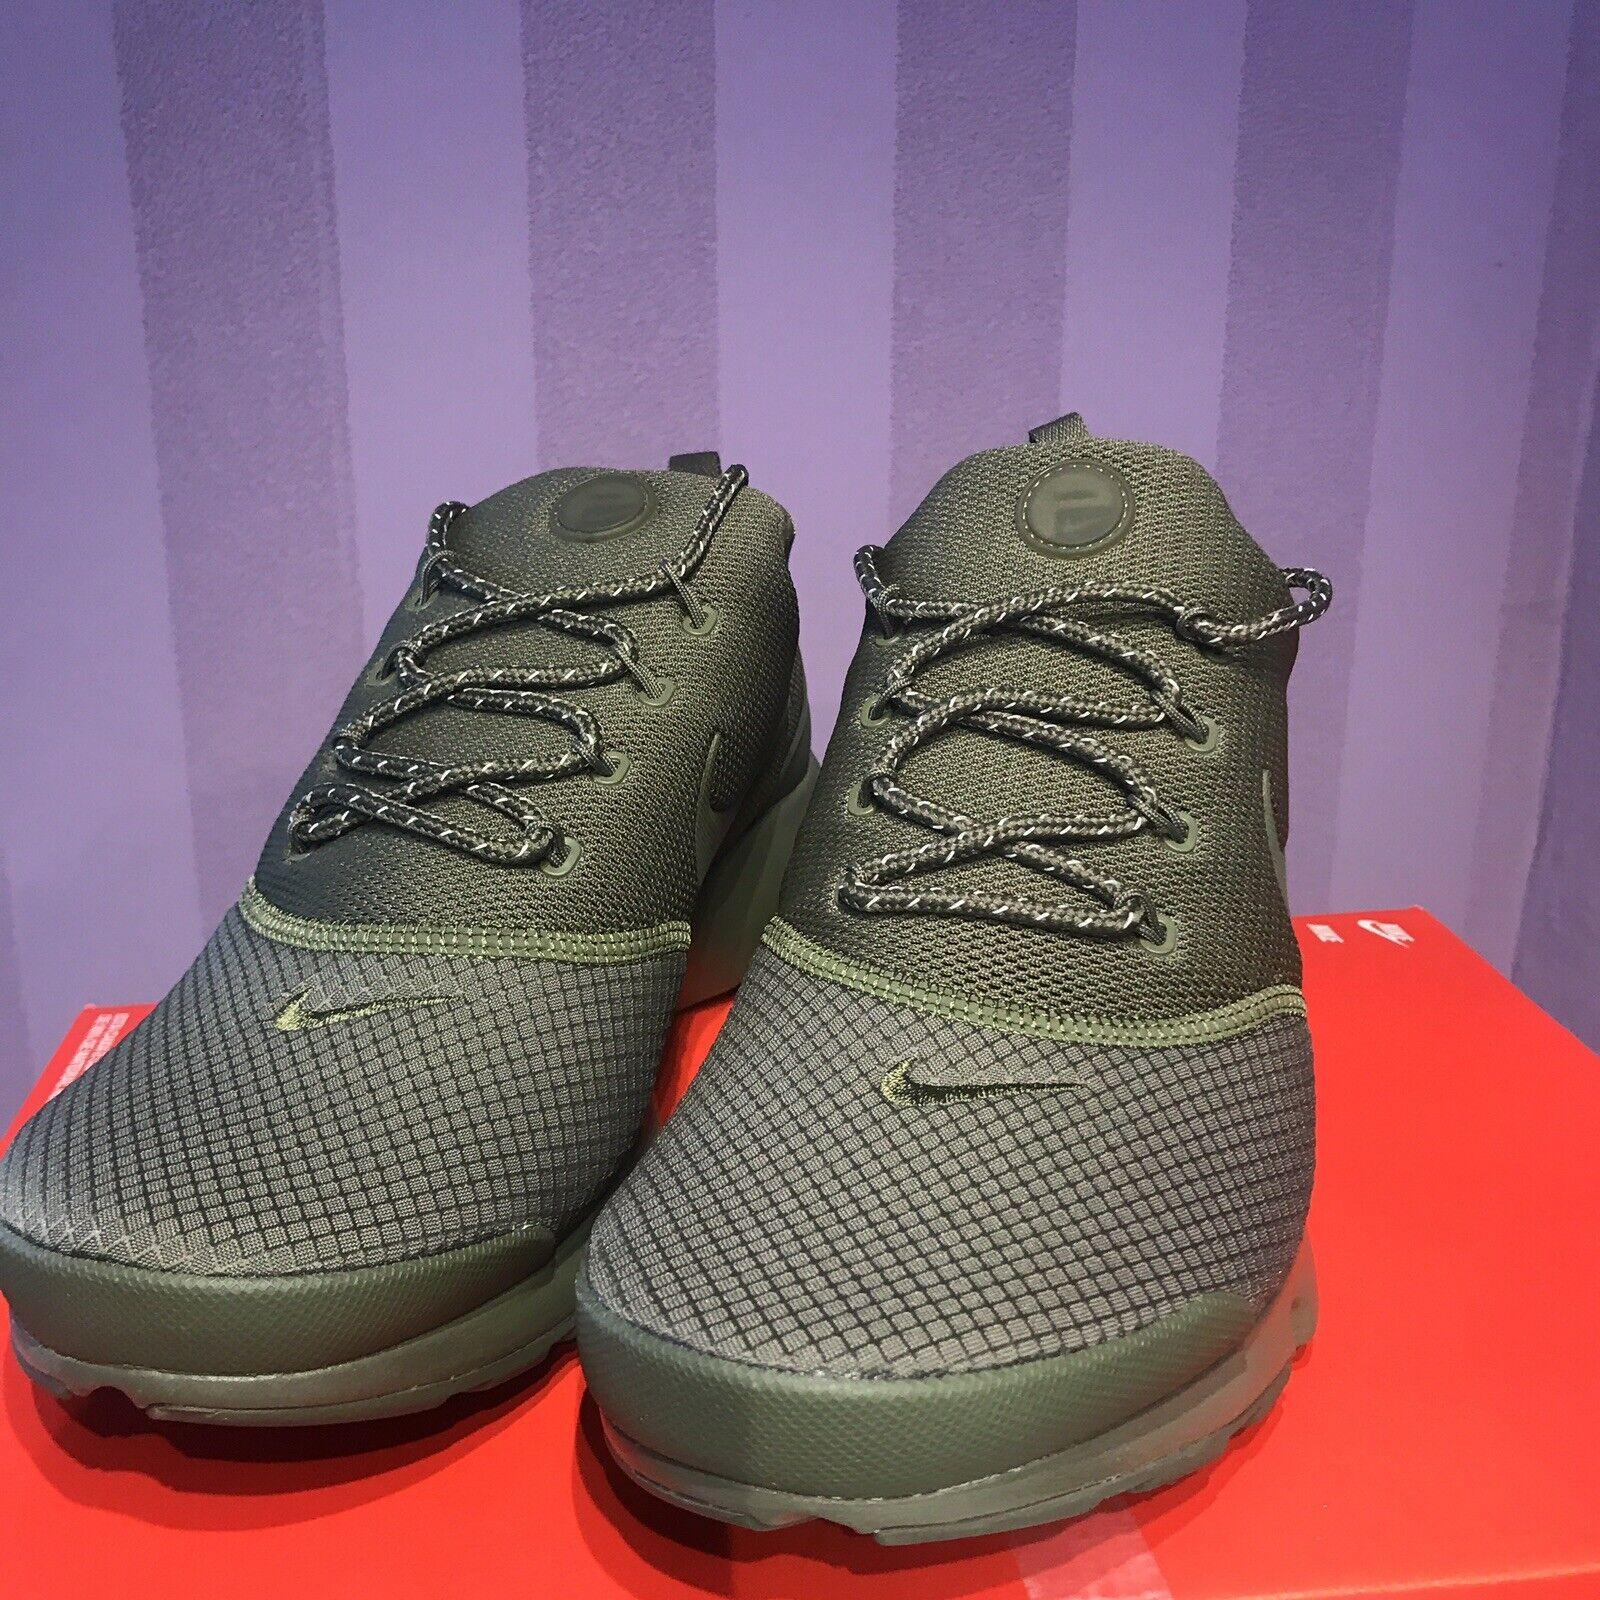 NEU Nike Presto Fly SE Herren Turnschuhe Turnschuhe 42 UK 7,5 US 8,5 908020201